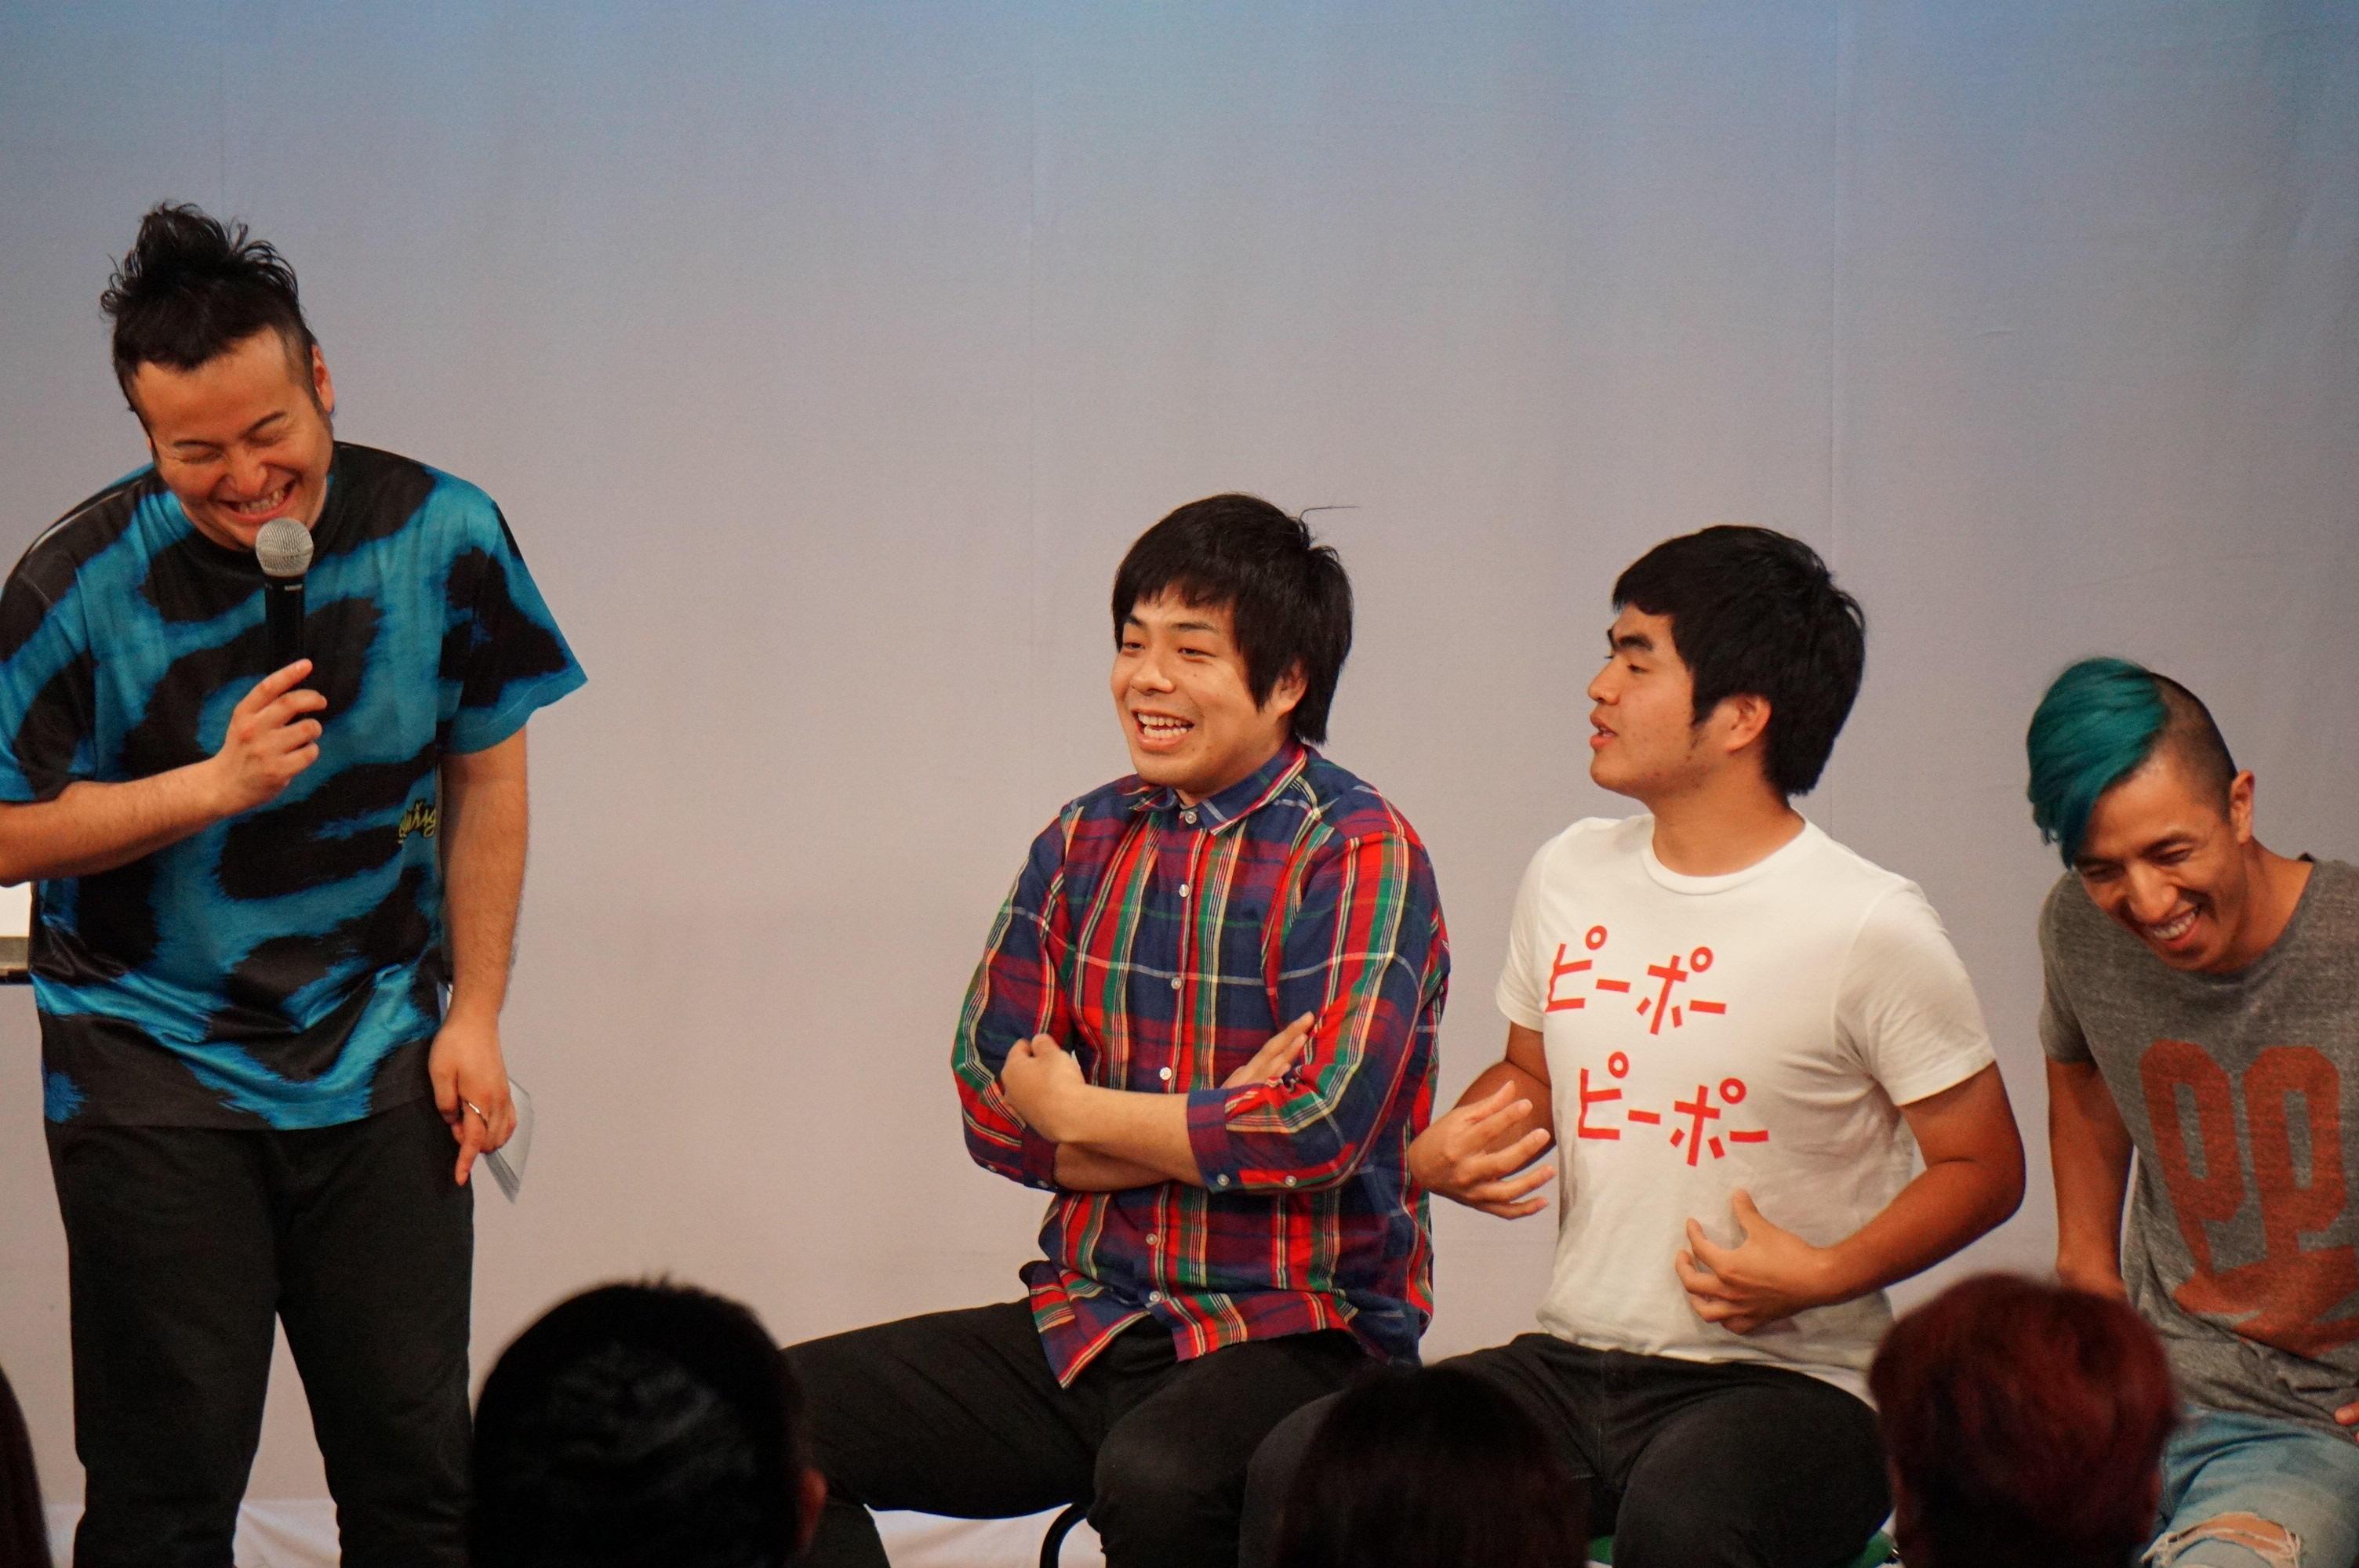 http://news.yoshimoto.co.jp/20160526174332-49c26bde3b63d55364256781a1d98ebbd7d83552.jpg